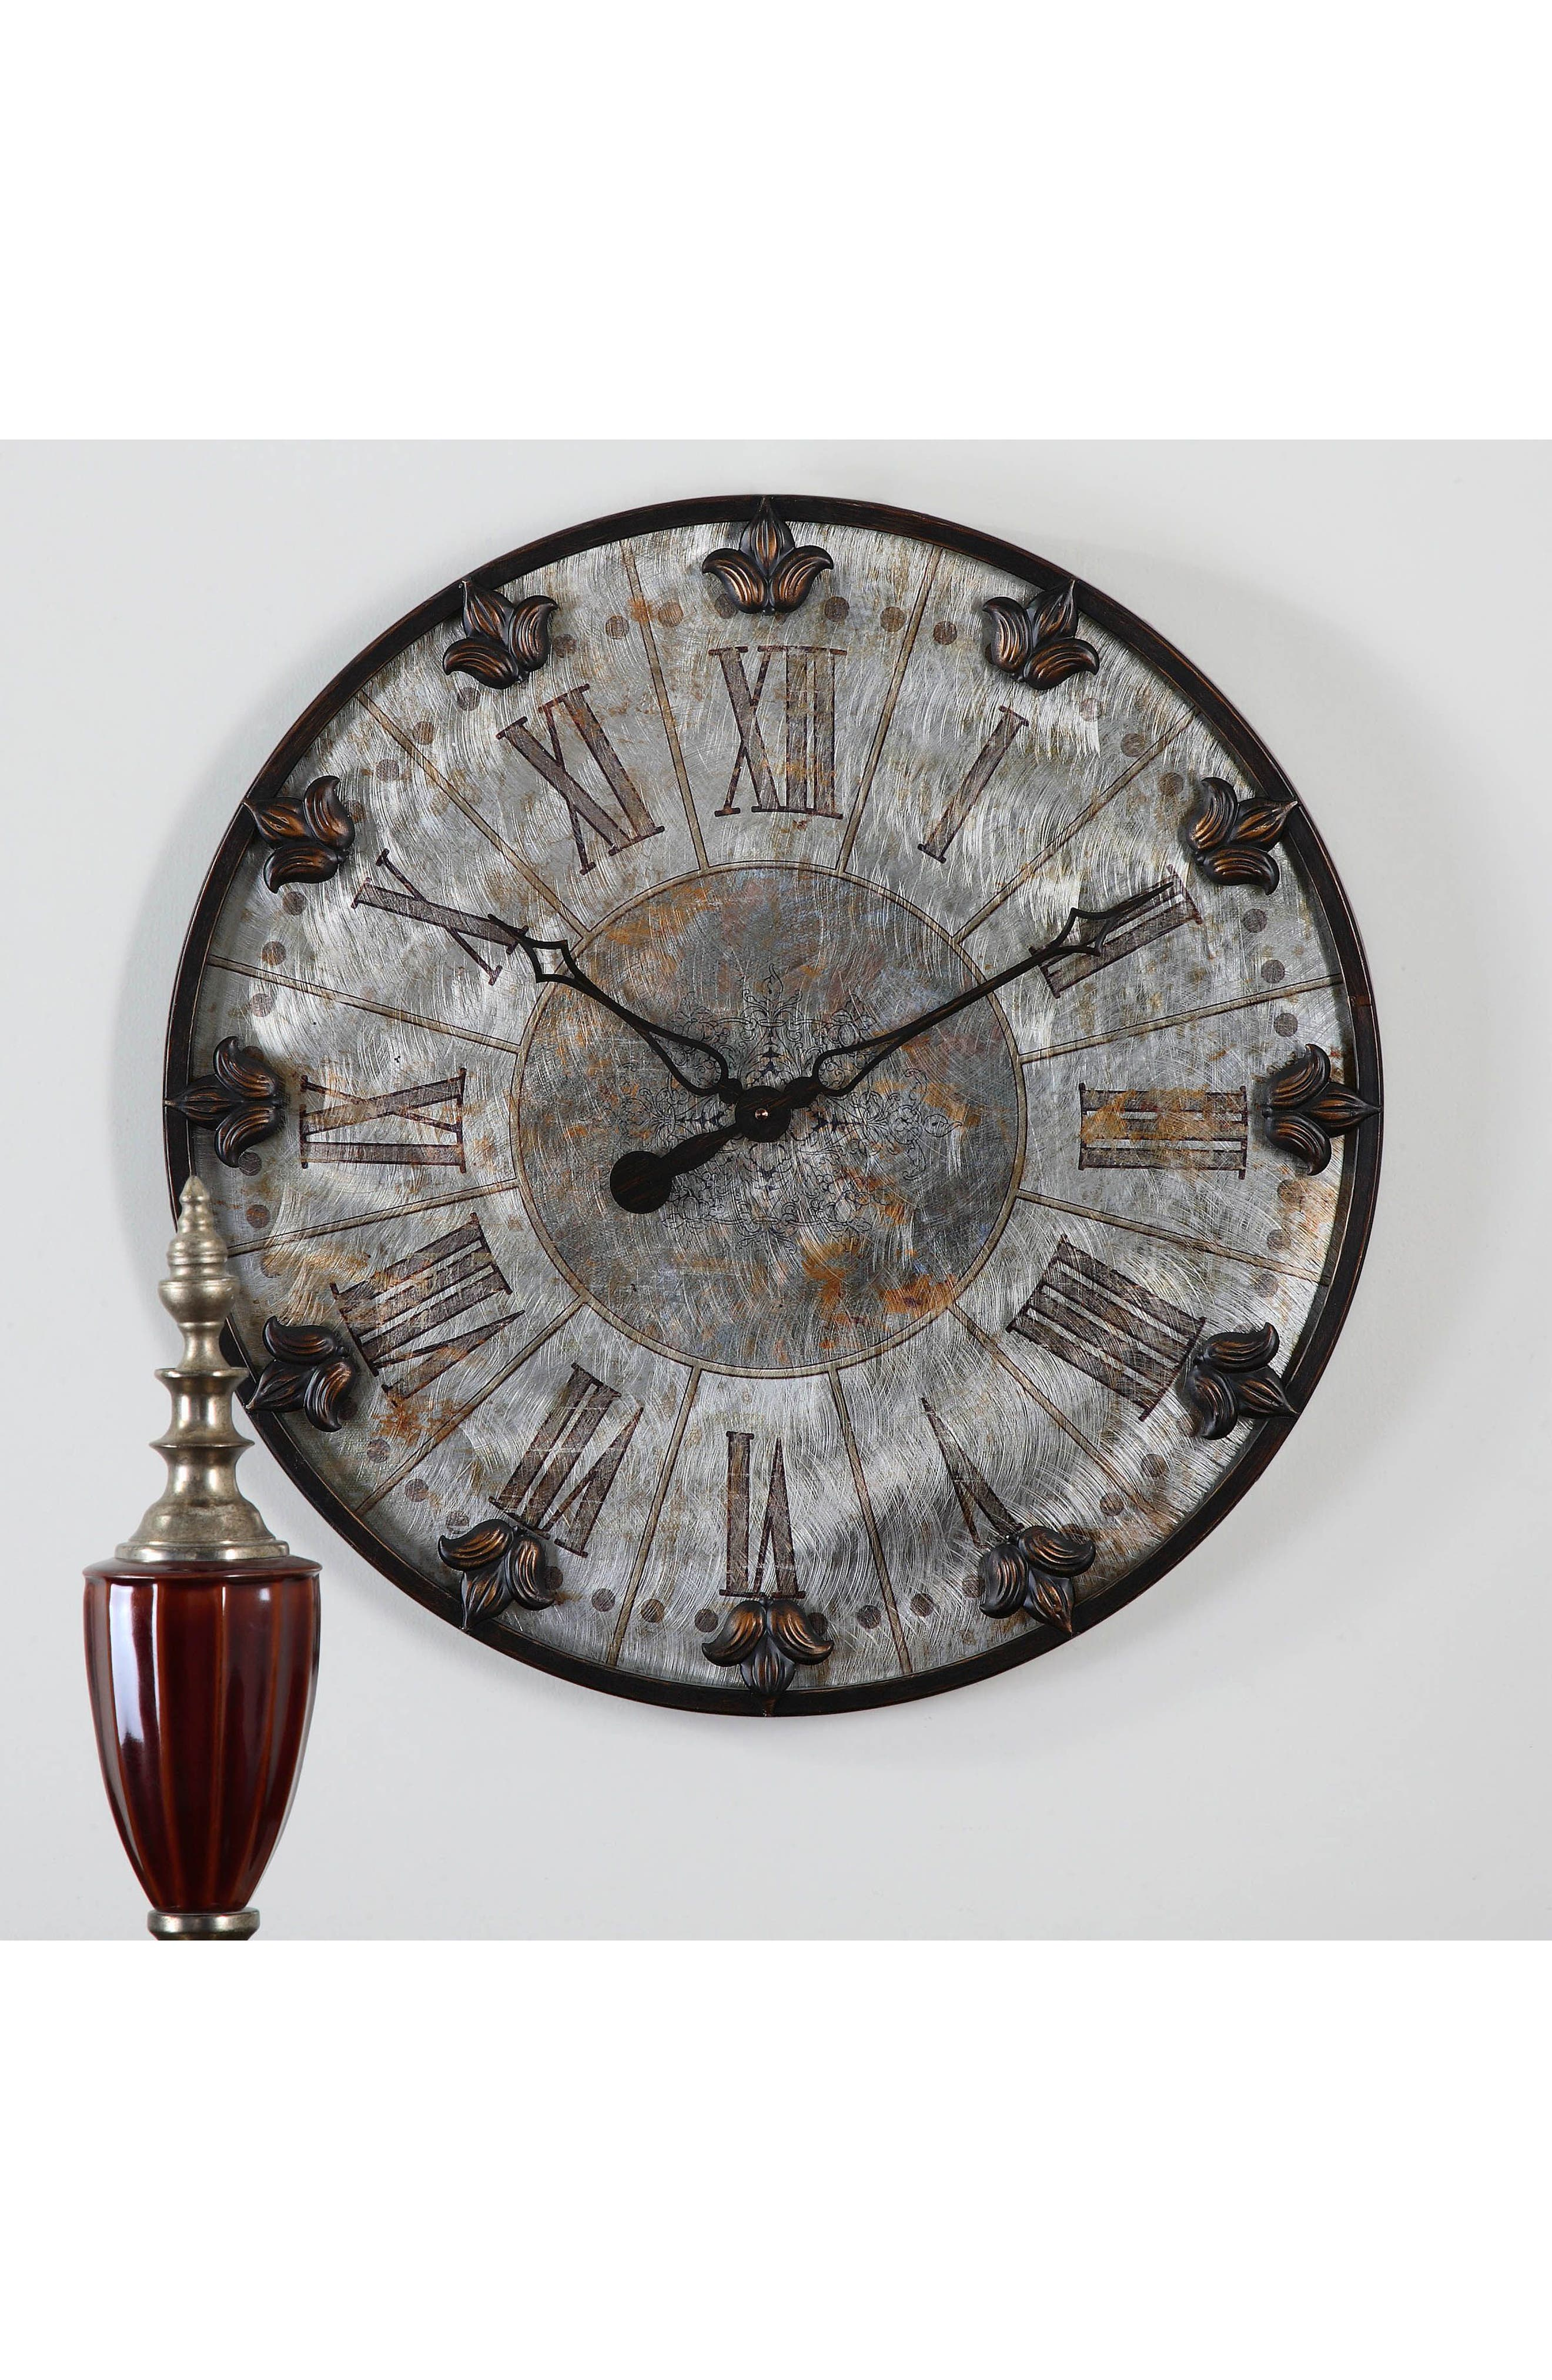 Artemis Wall Clock,                             Alternate thumbnail 2, color,                             Metallic Rust/ Copper